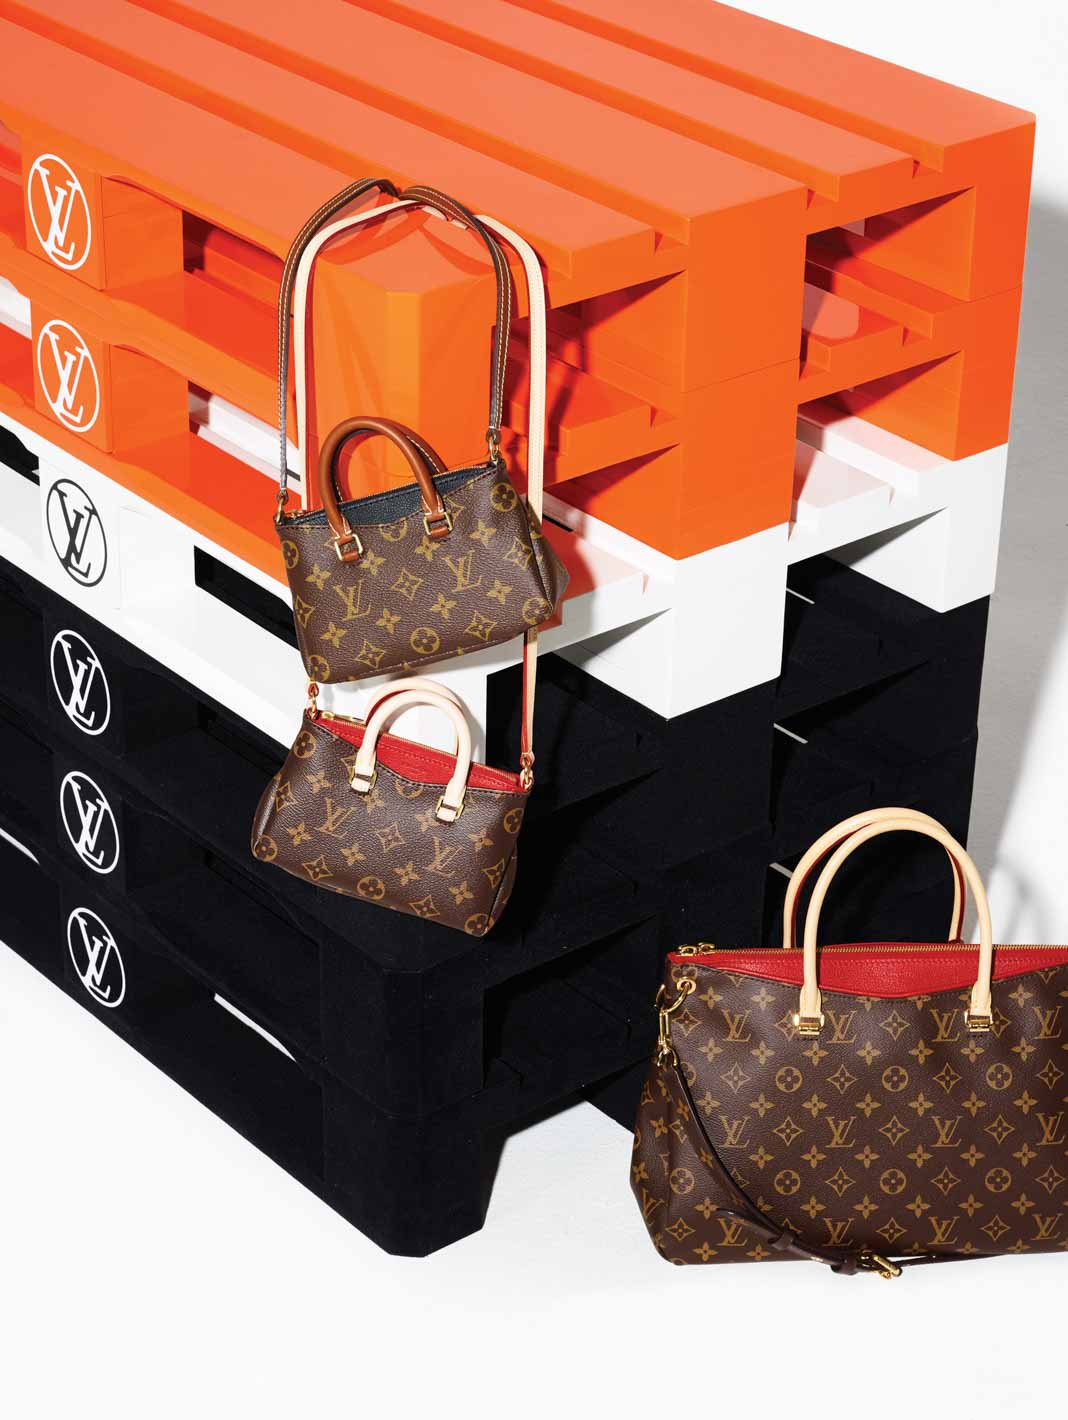 tui-nano-Louis-Vuitton-TT-619-2015-1